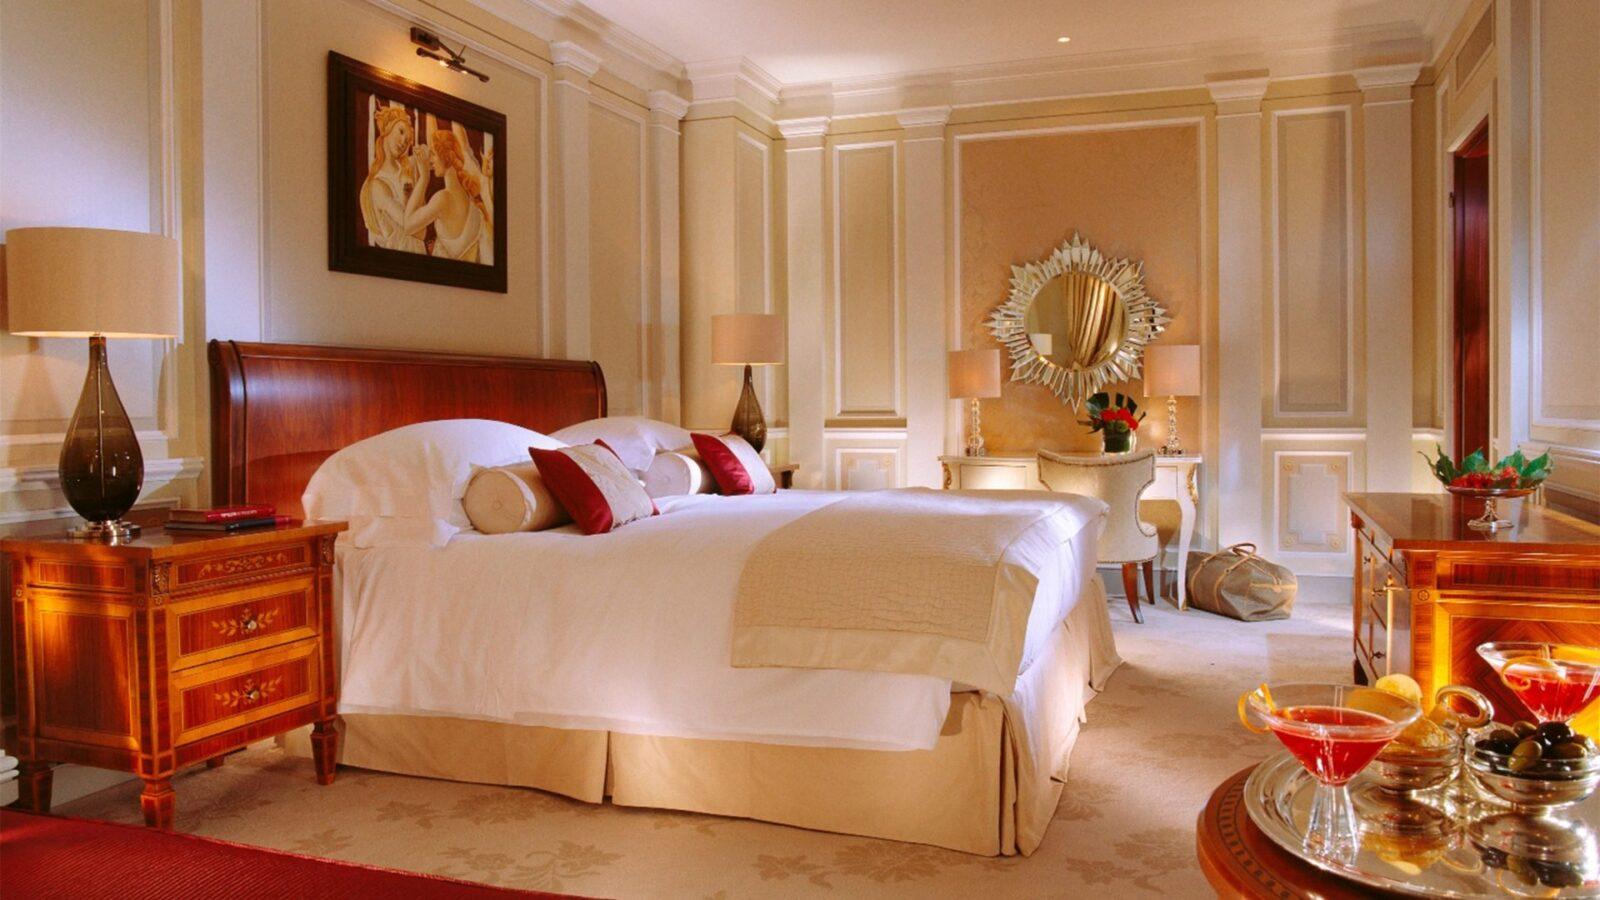 Principe Suite at Hotel Principe di Savoia